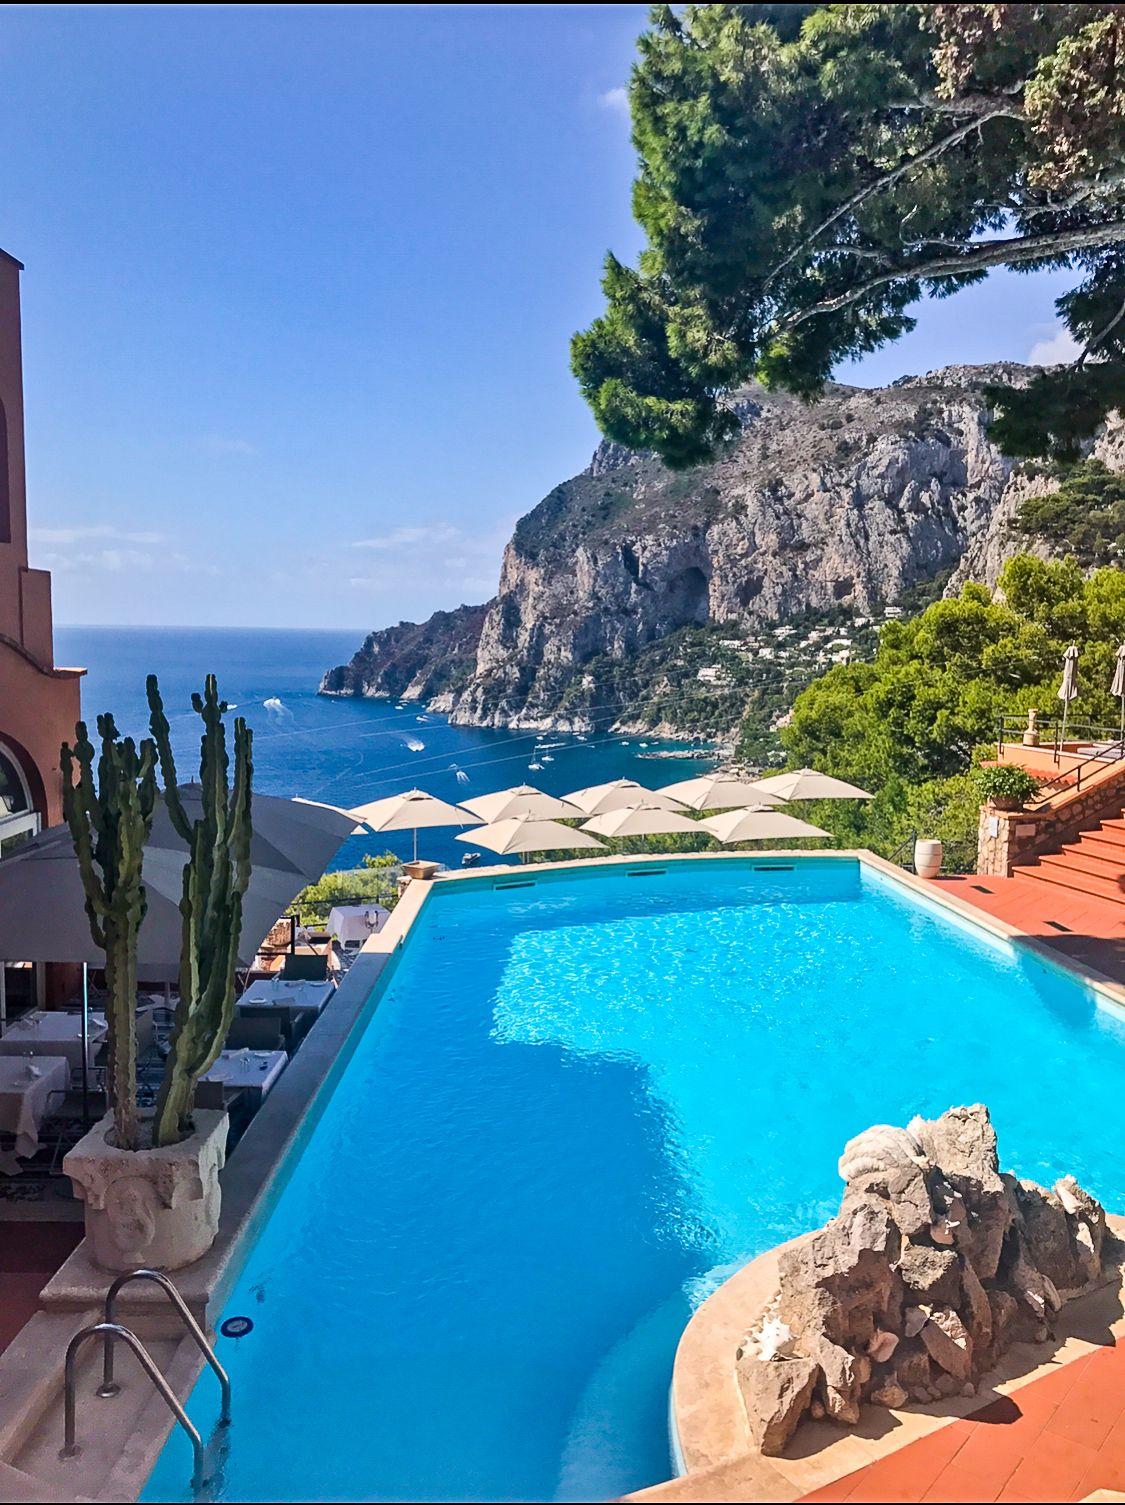 Where to Stay in Capri Italy Amalfi Coast